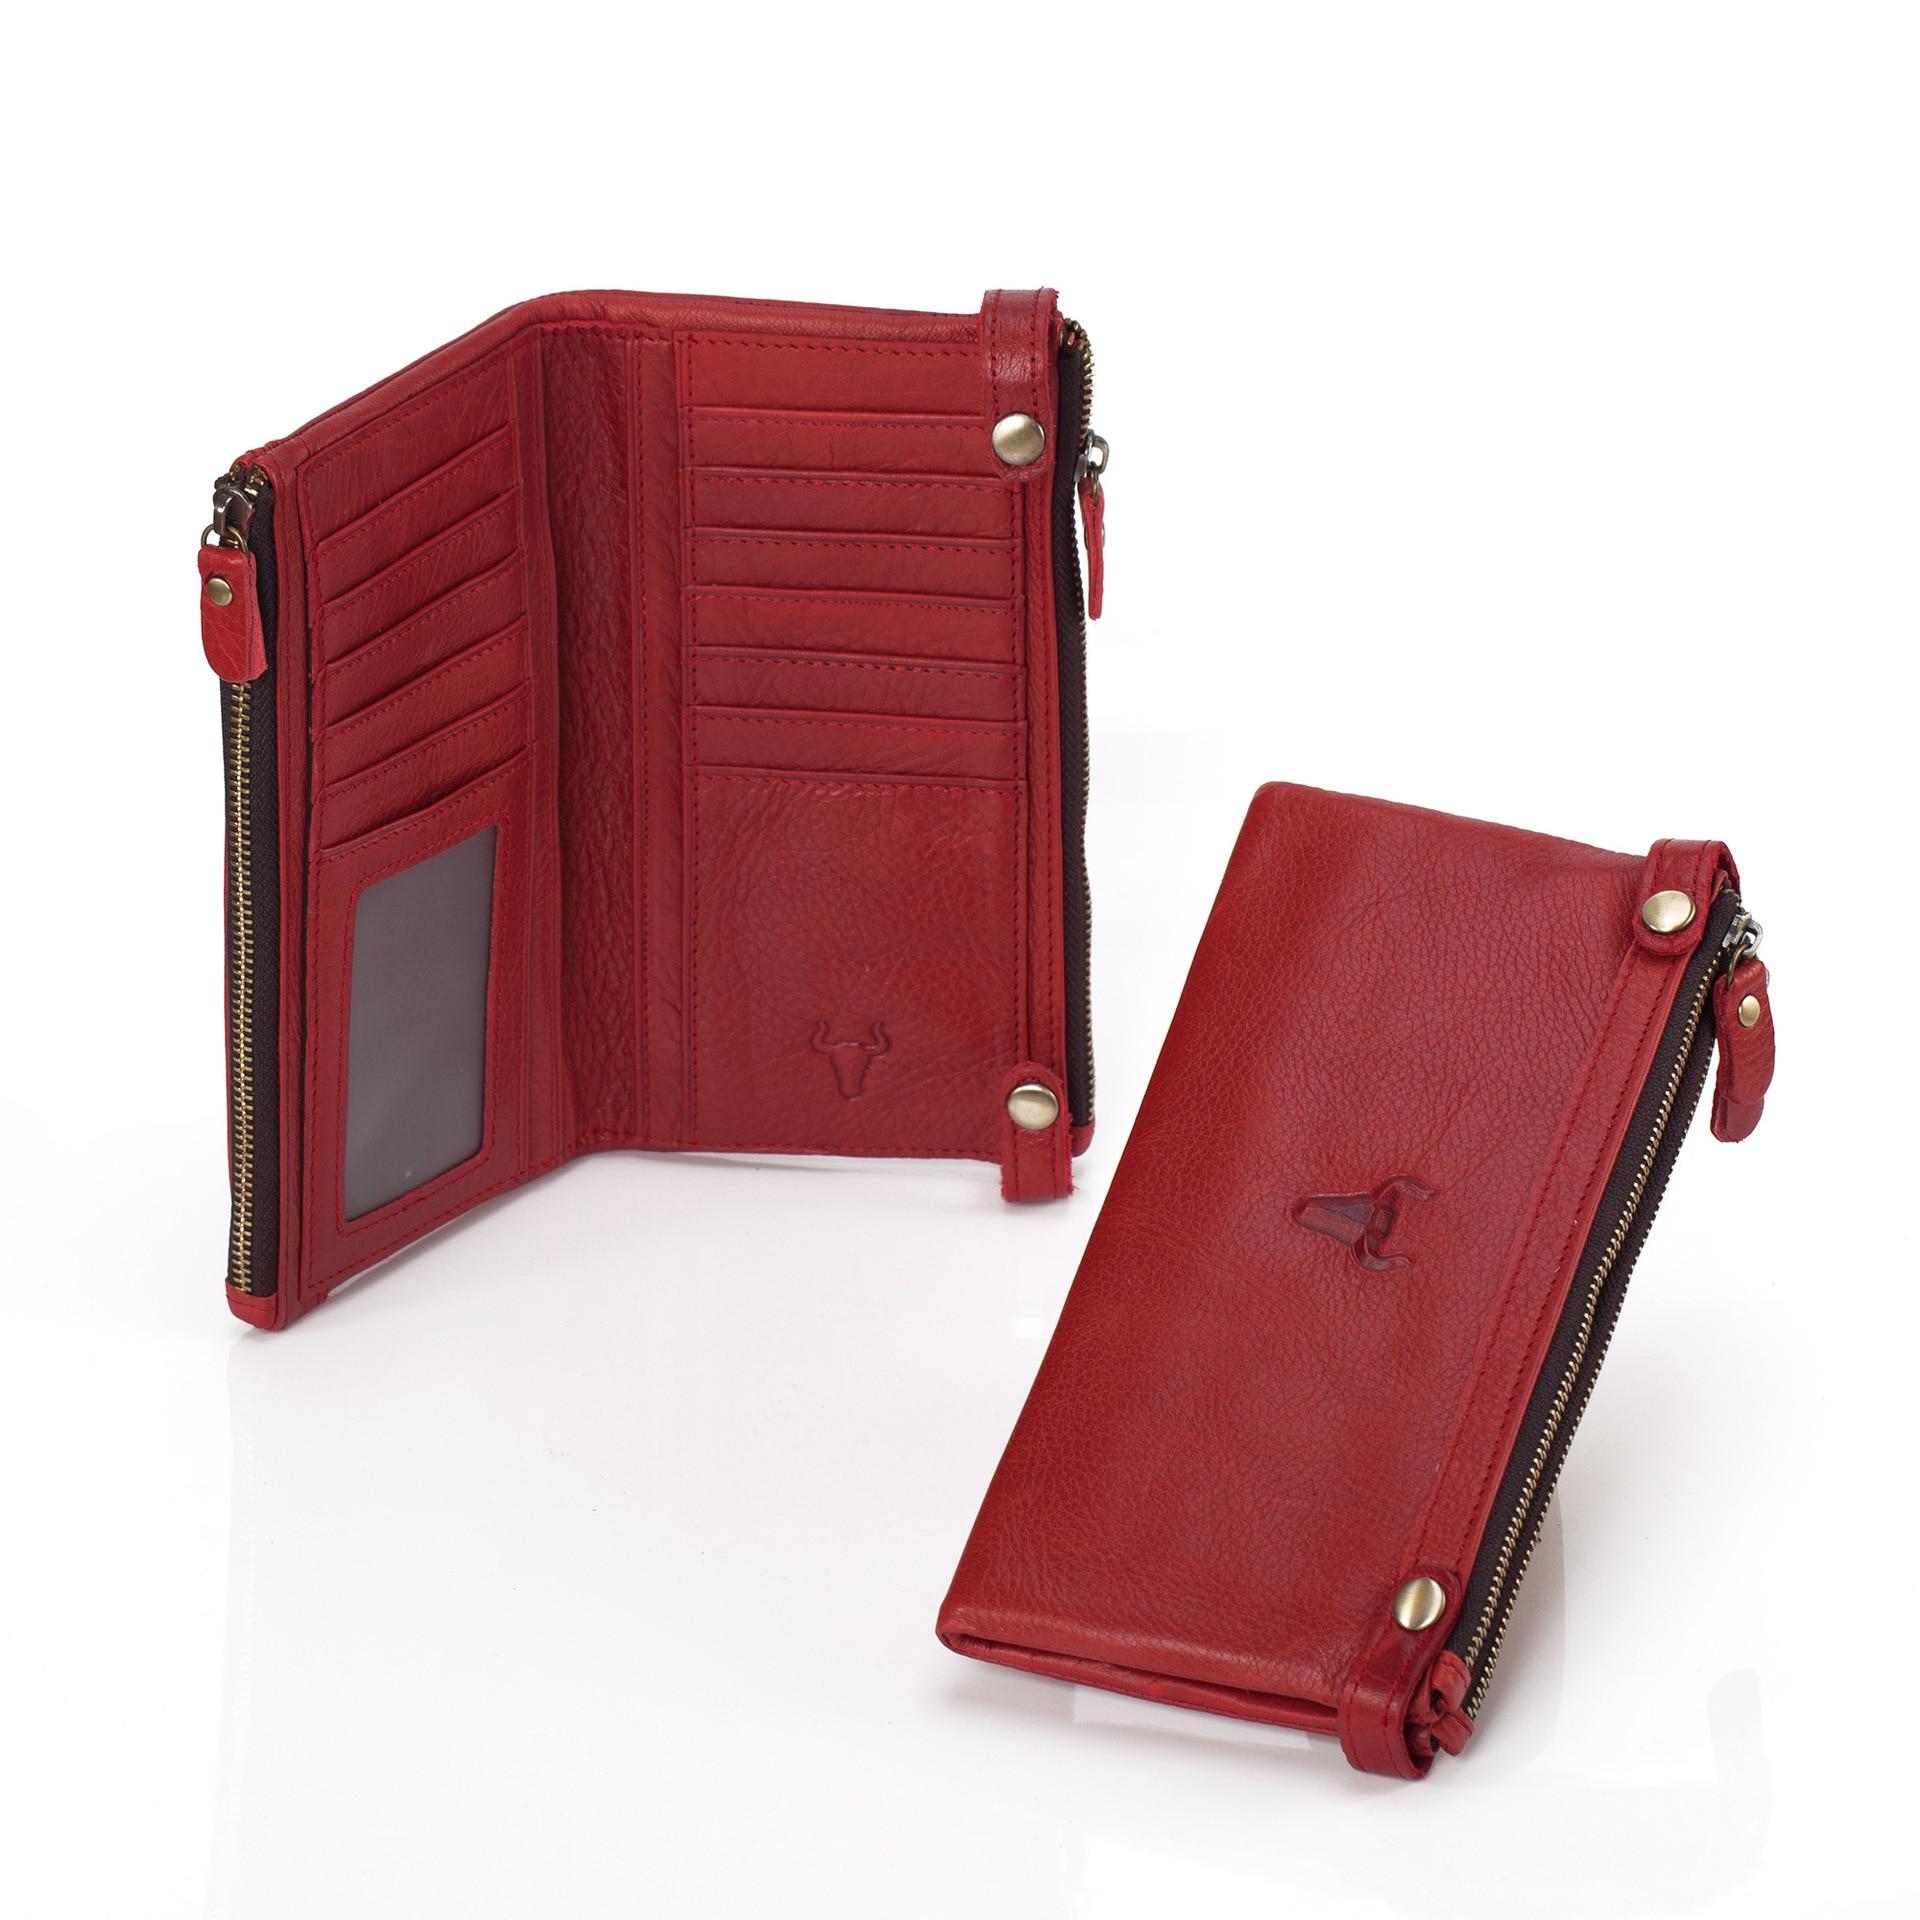 ФОТО Designer Wallets Famous Brand Women Wallet 2016 Fashion Women Bag Zipper Long Purse Designer Cell Phone Case Carteira